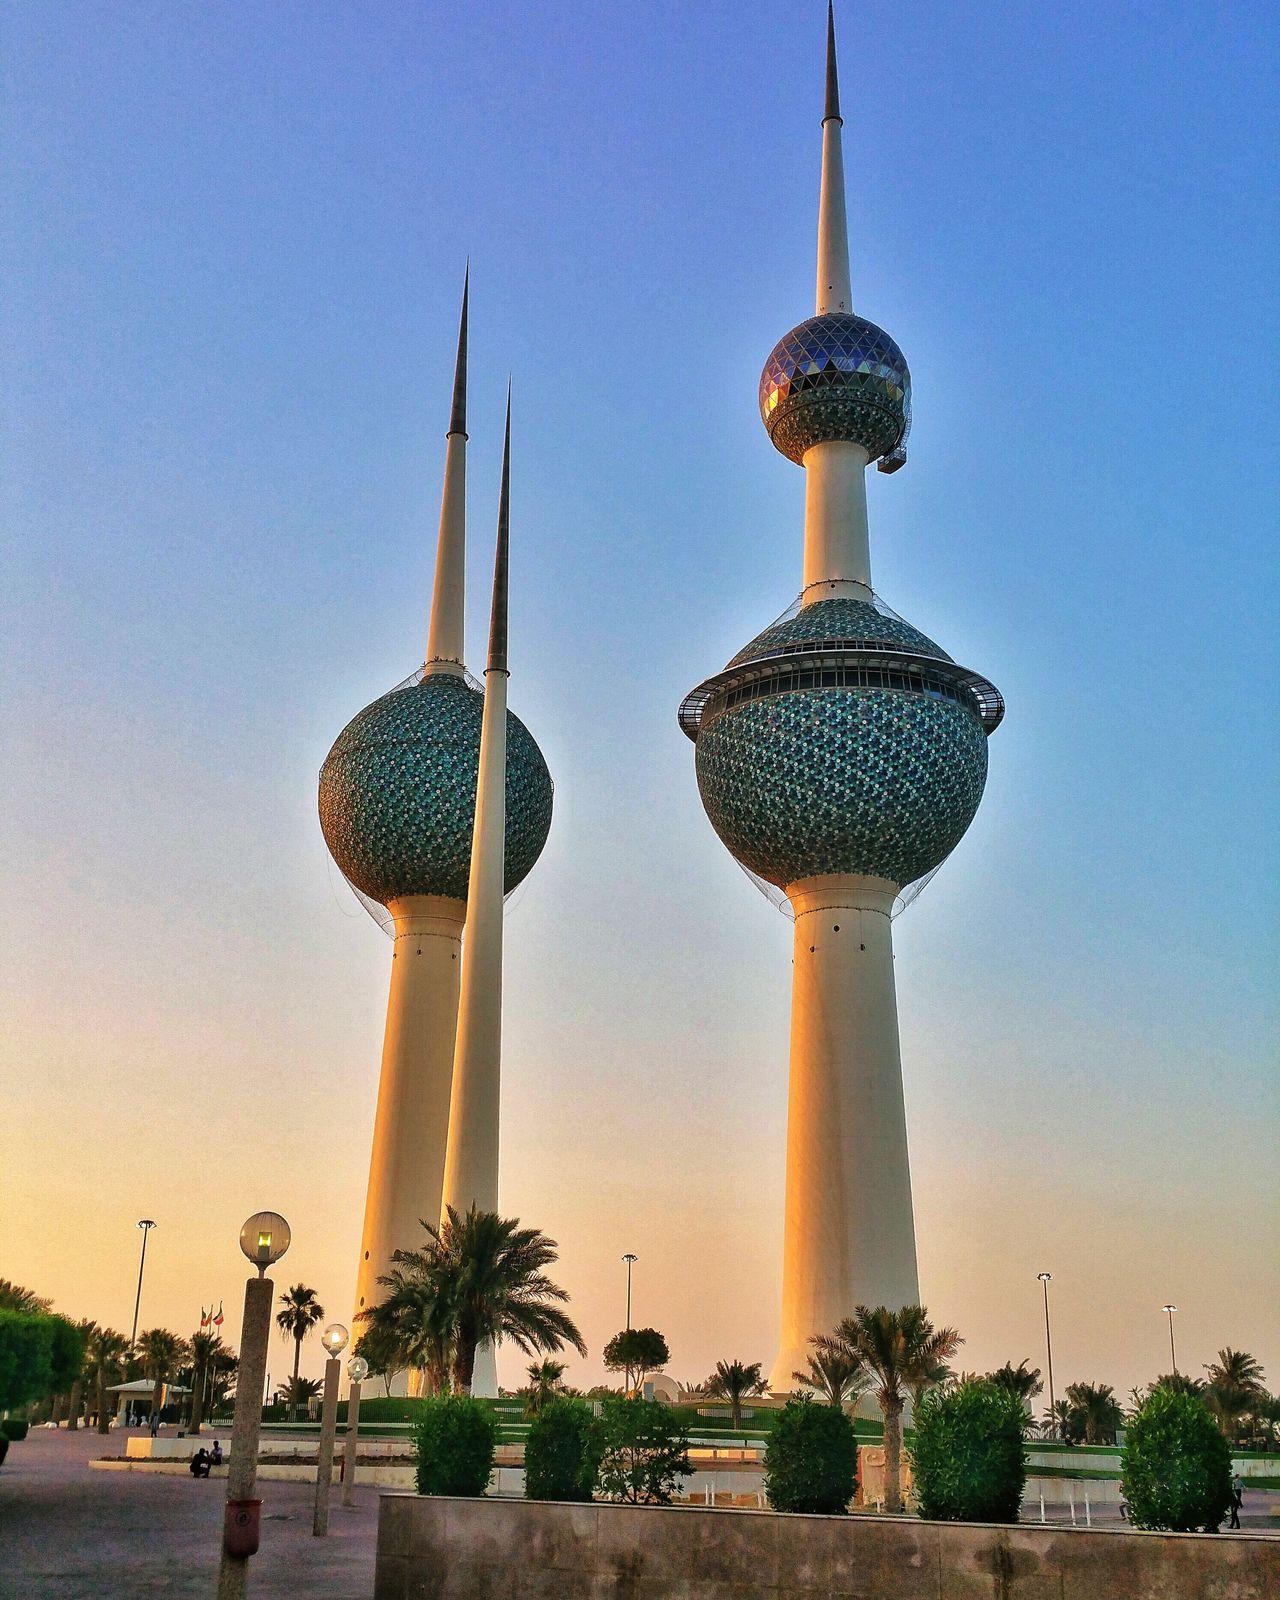 Kuwait Kuwait Towers Kuwaitinstagram Kuwaitstreetphotography Middle East Middleeast Gulf